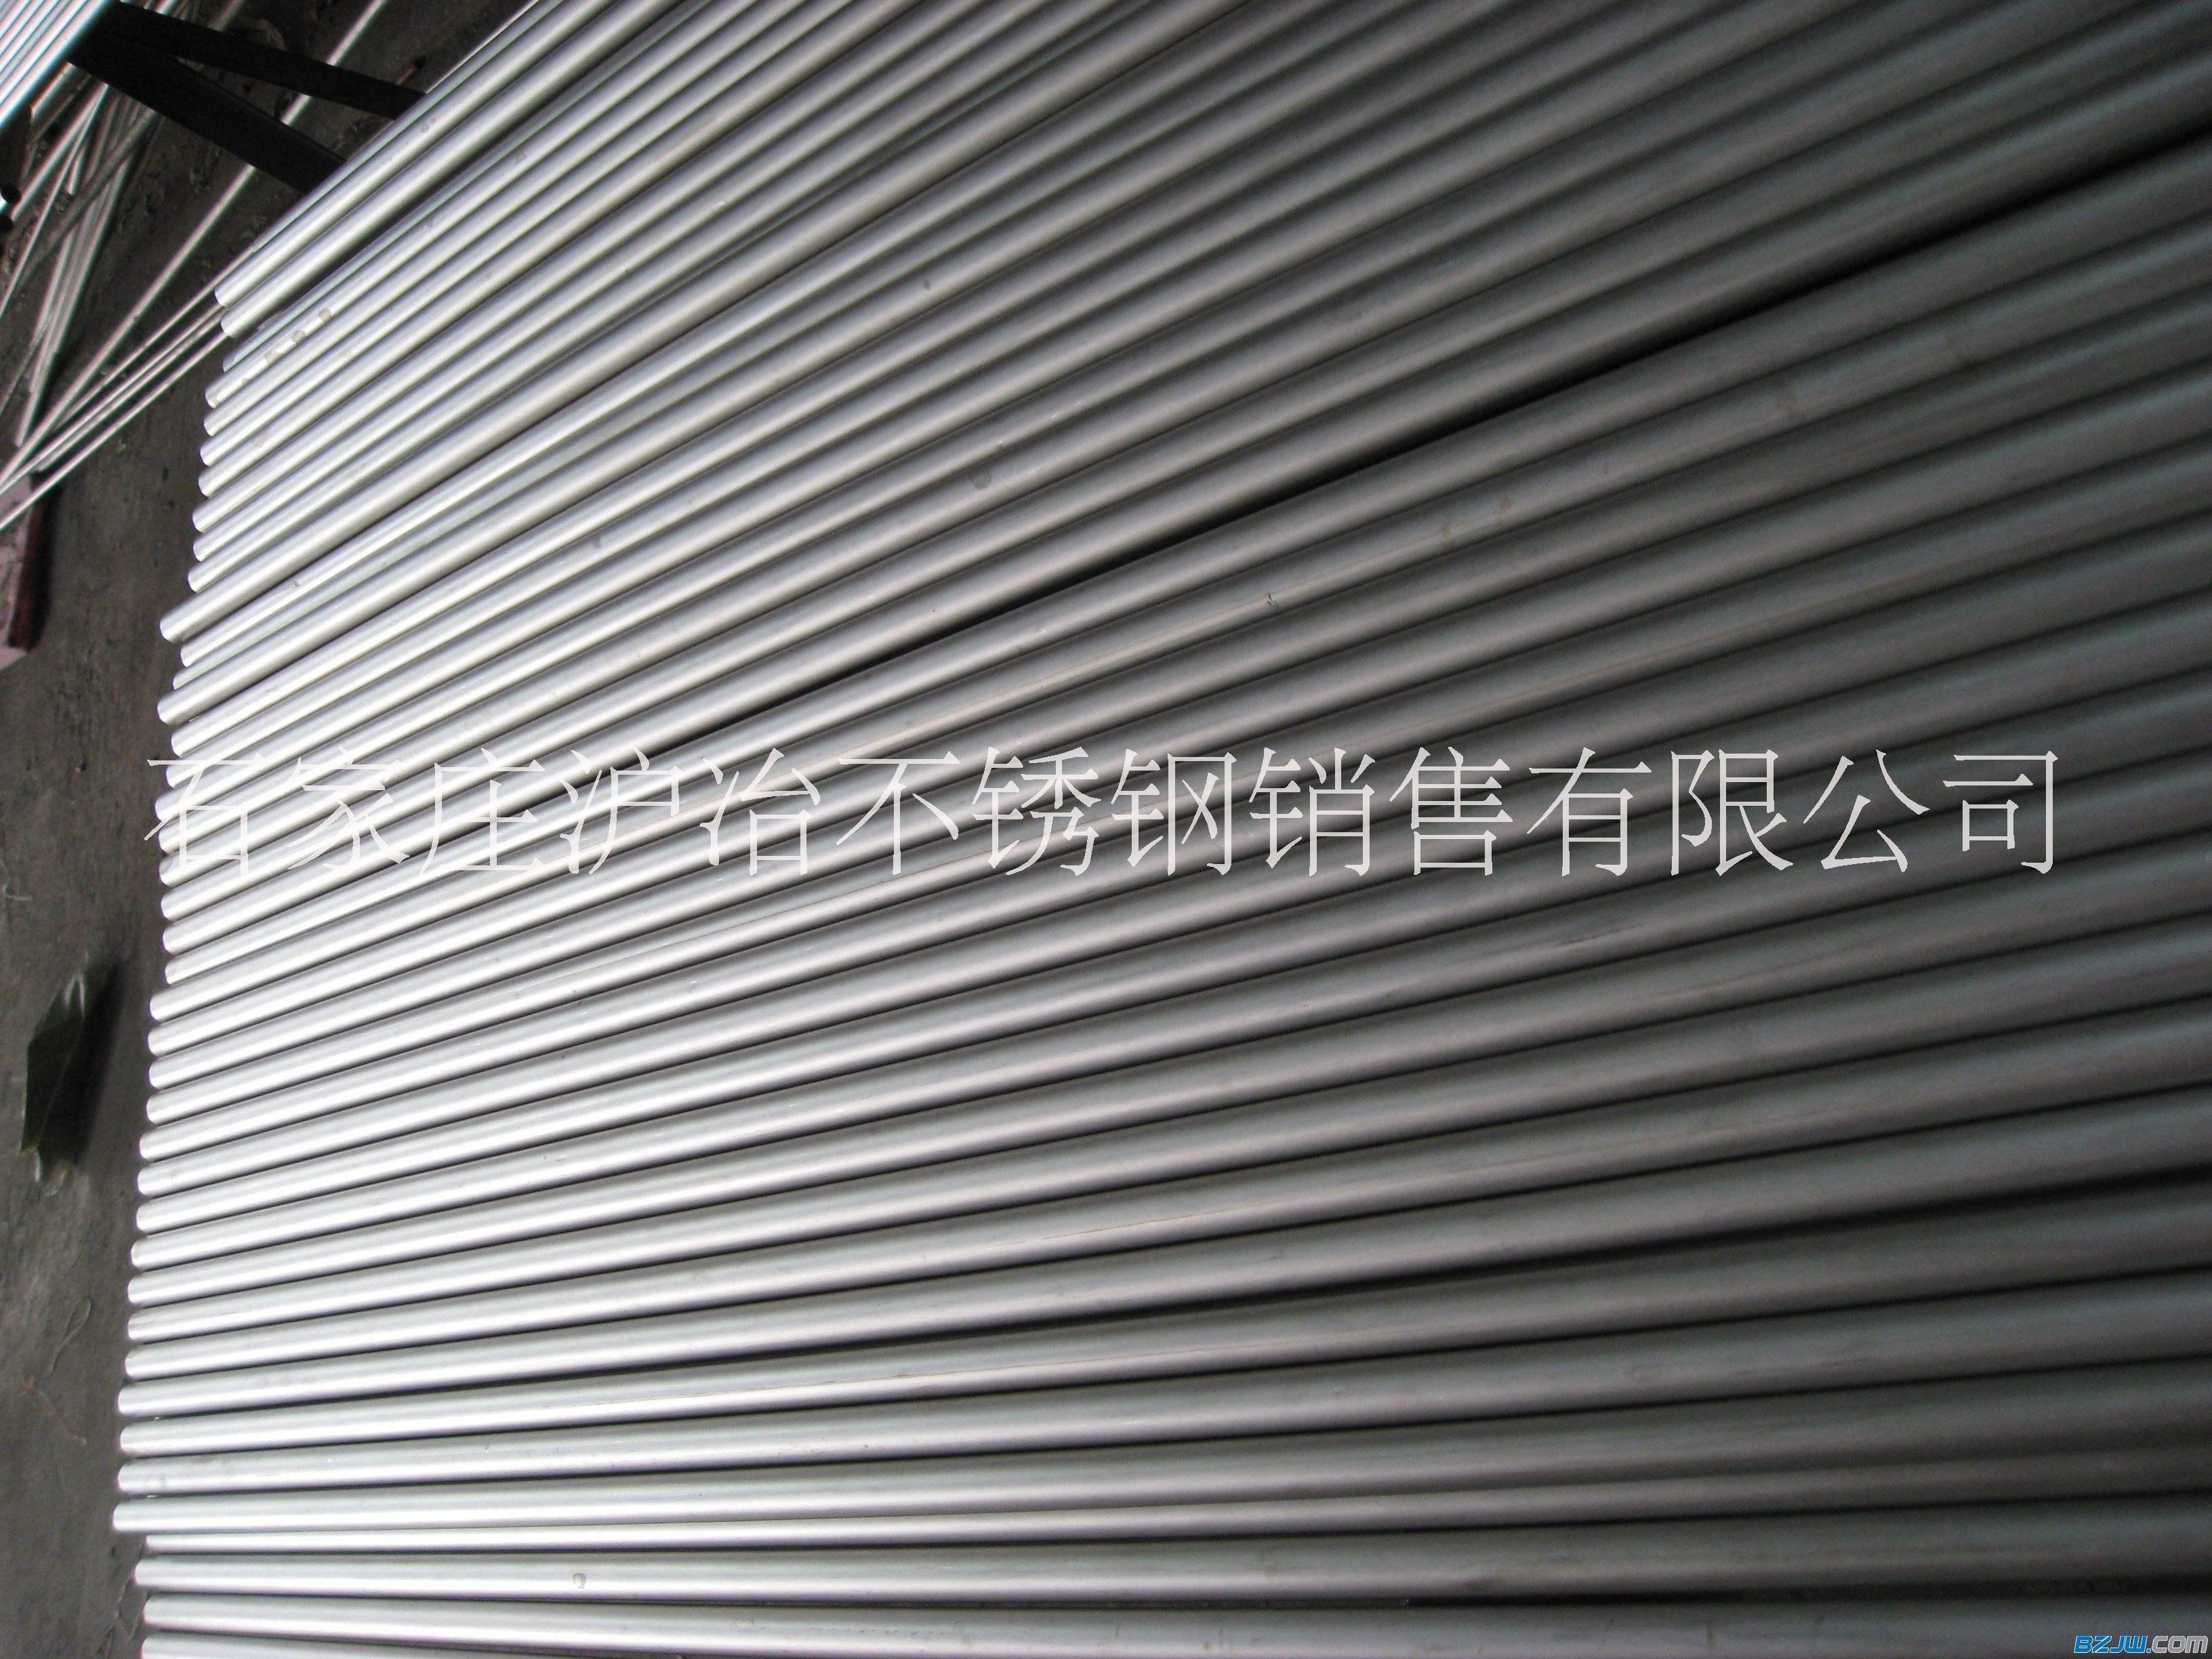 TA1 TA2纯钛管 钛合金管 工业无缝钛管 现货供应 厂家直销 可零切